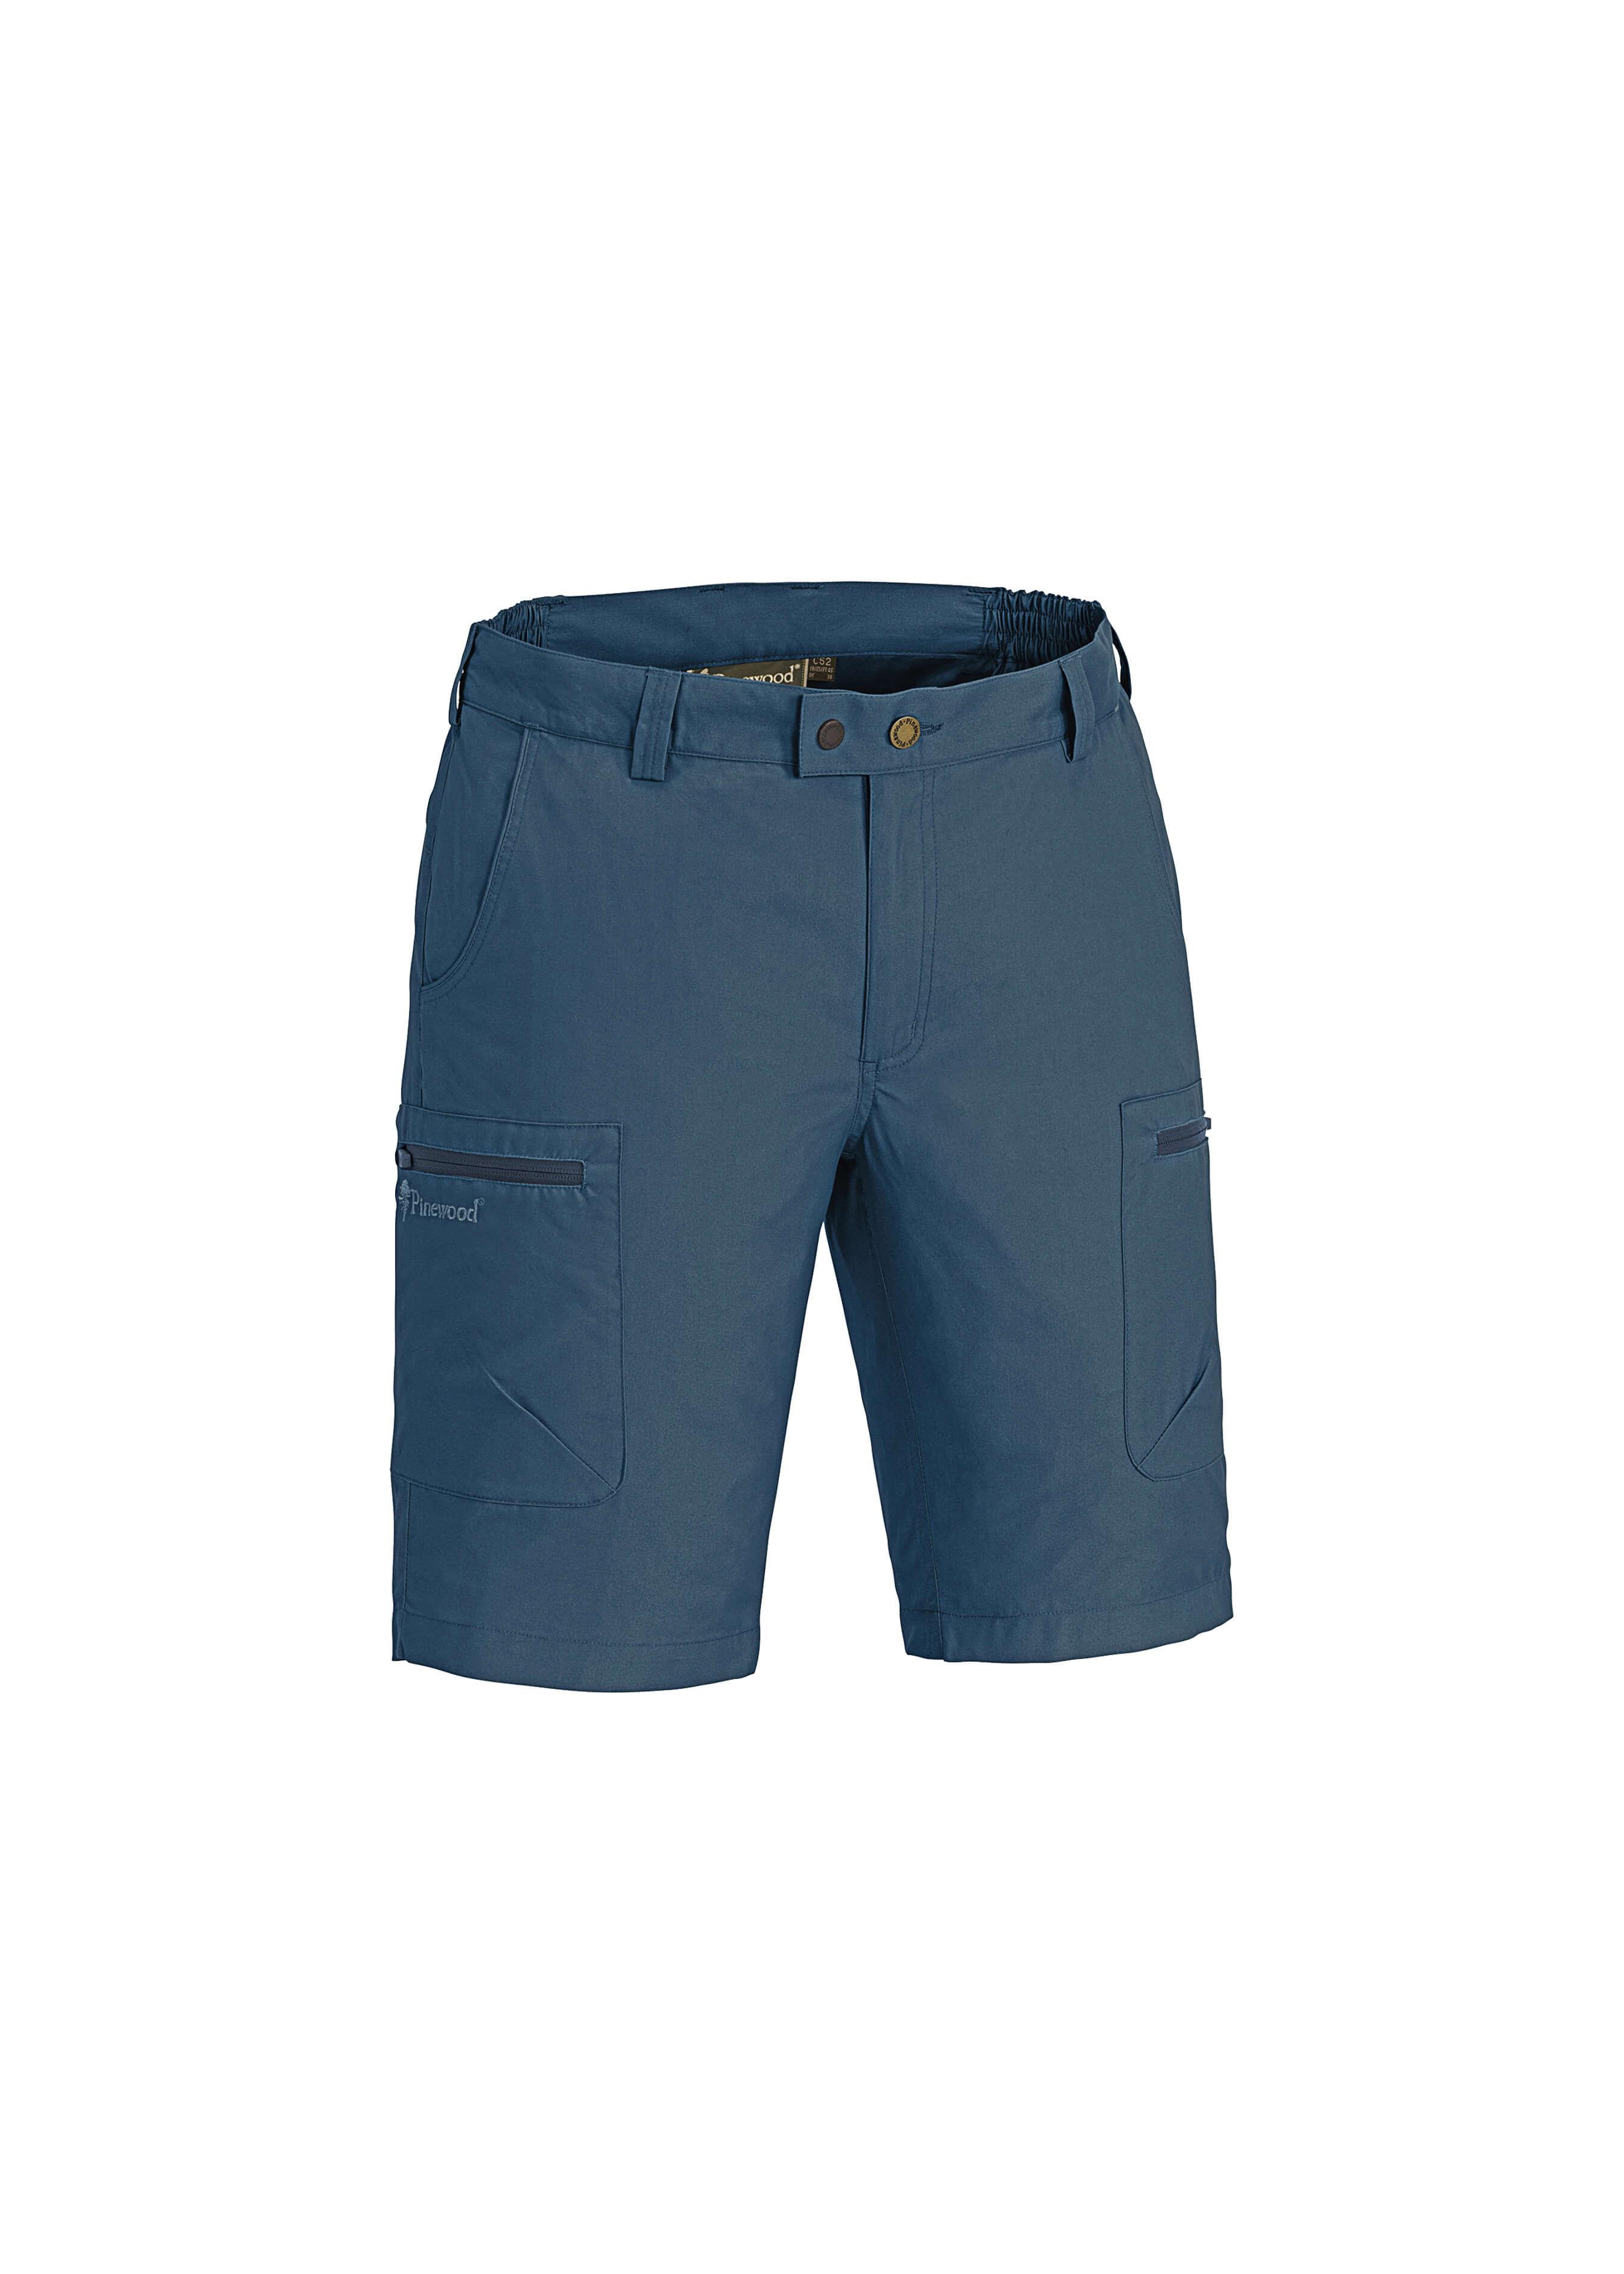 Pinewood Stretch-Short Tiveden 26853240 1